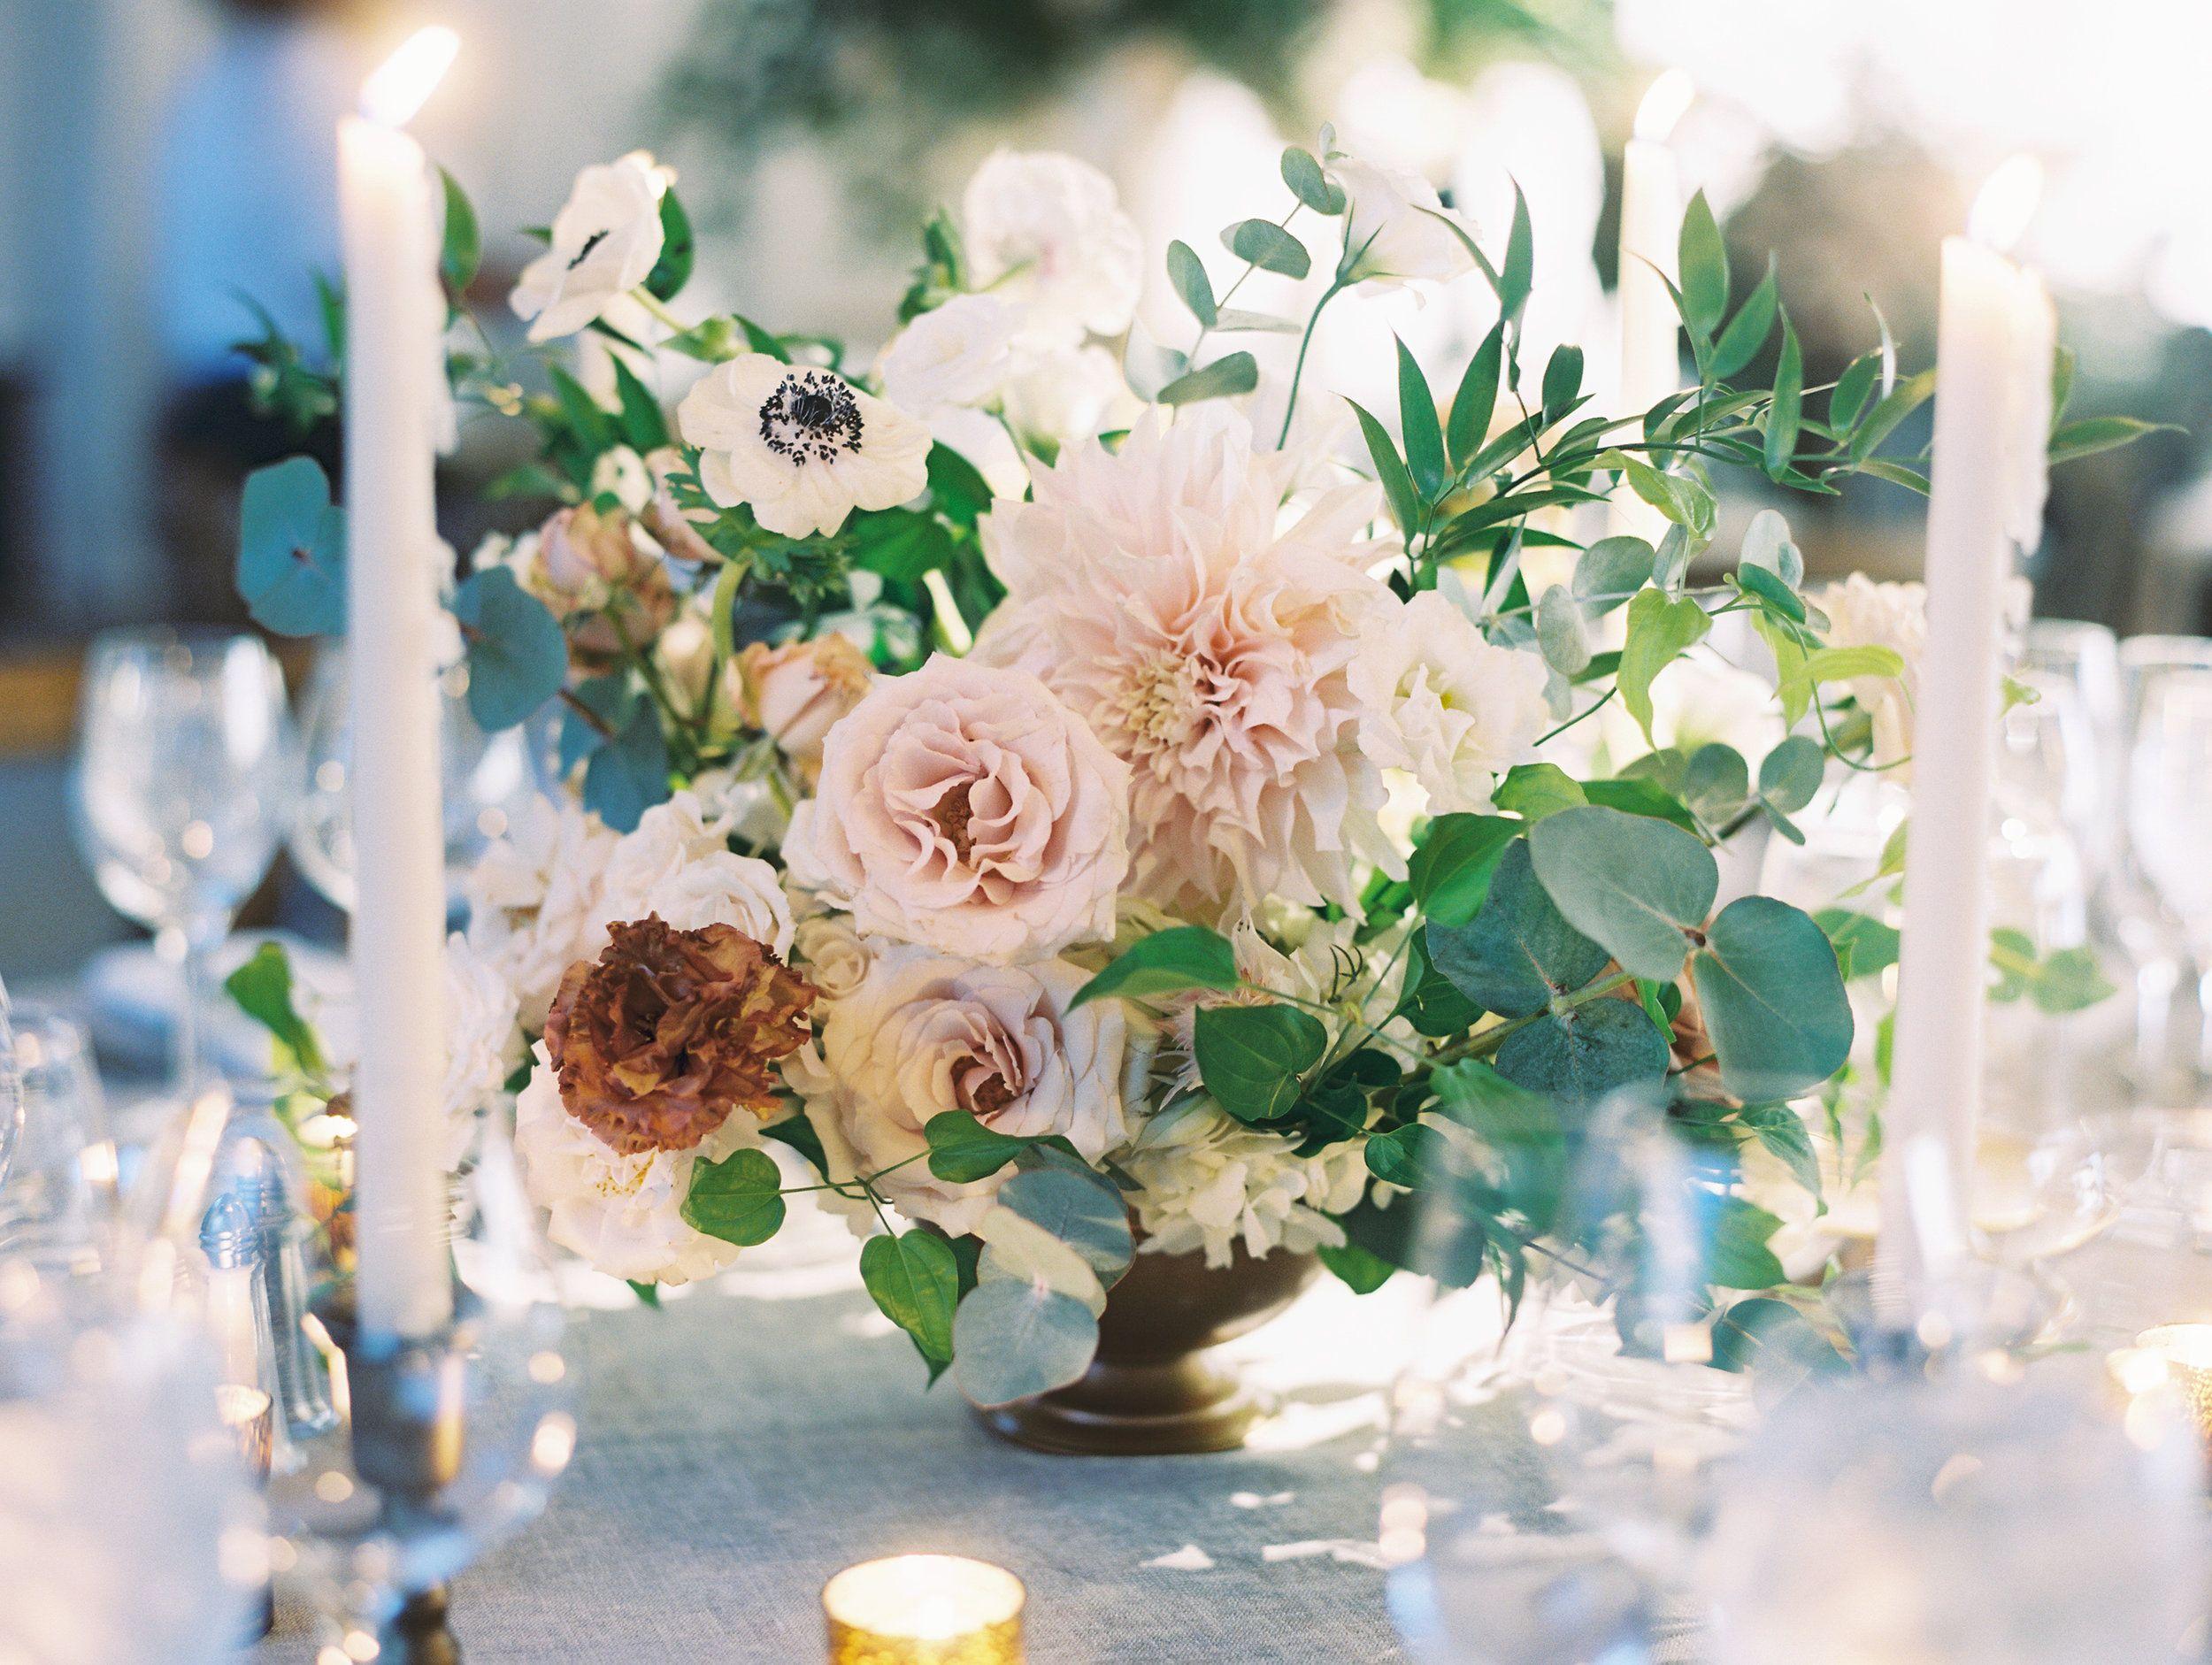 Abby Jiu Photography 921 Jpg Dahlia Centerpiece Wedding Dahlias Wedding Wedding Centerpieces